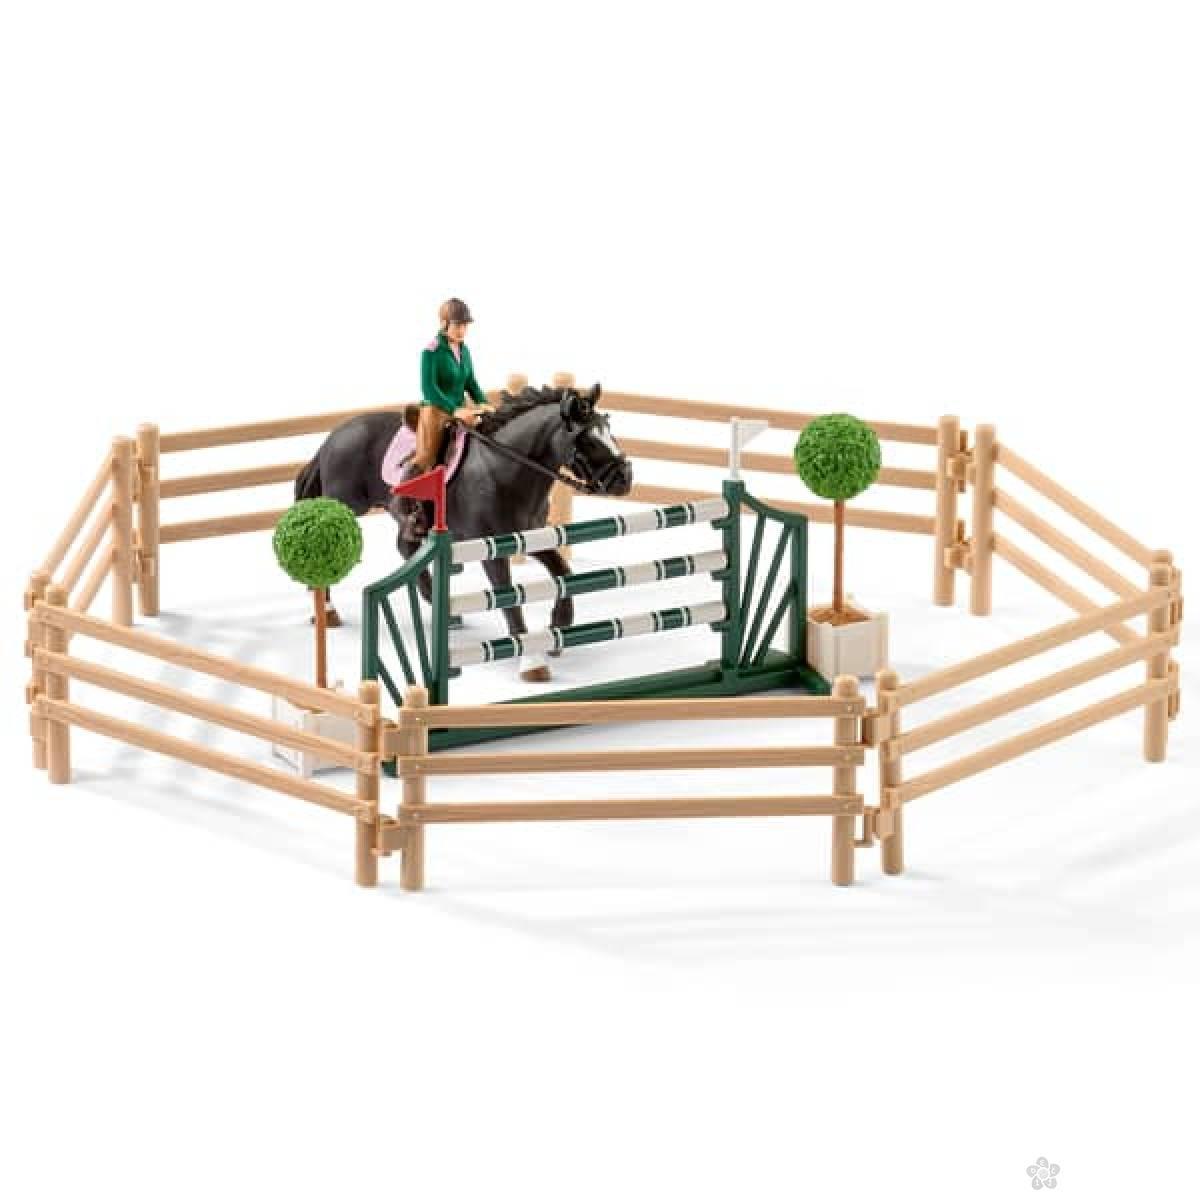 Skola jahanja sa konjima I jahacima 42389